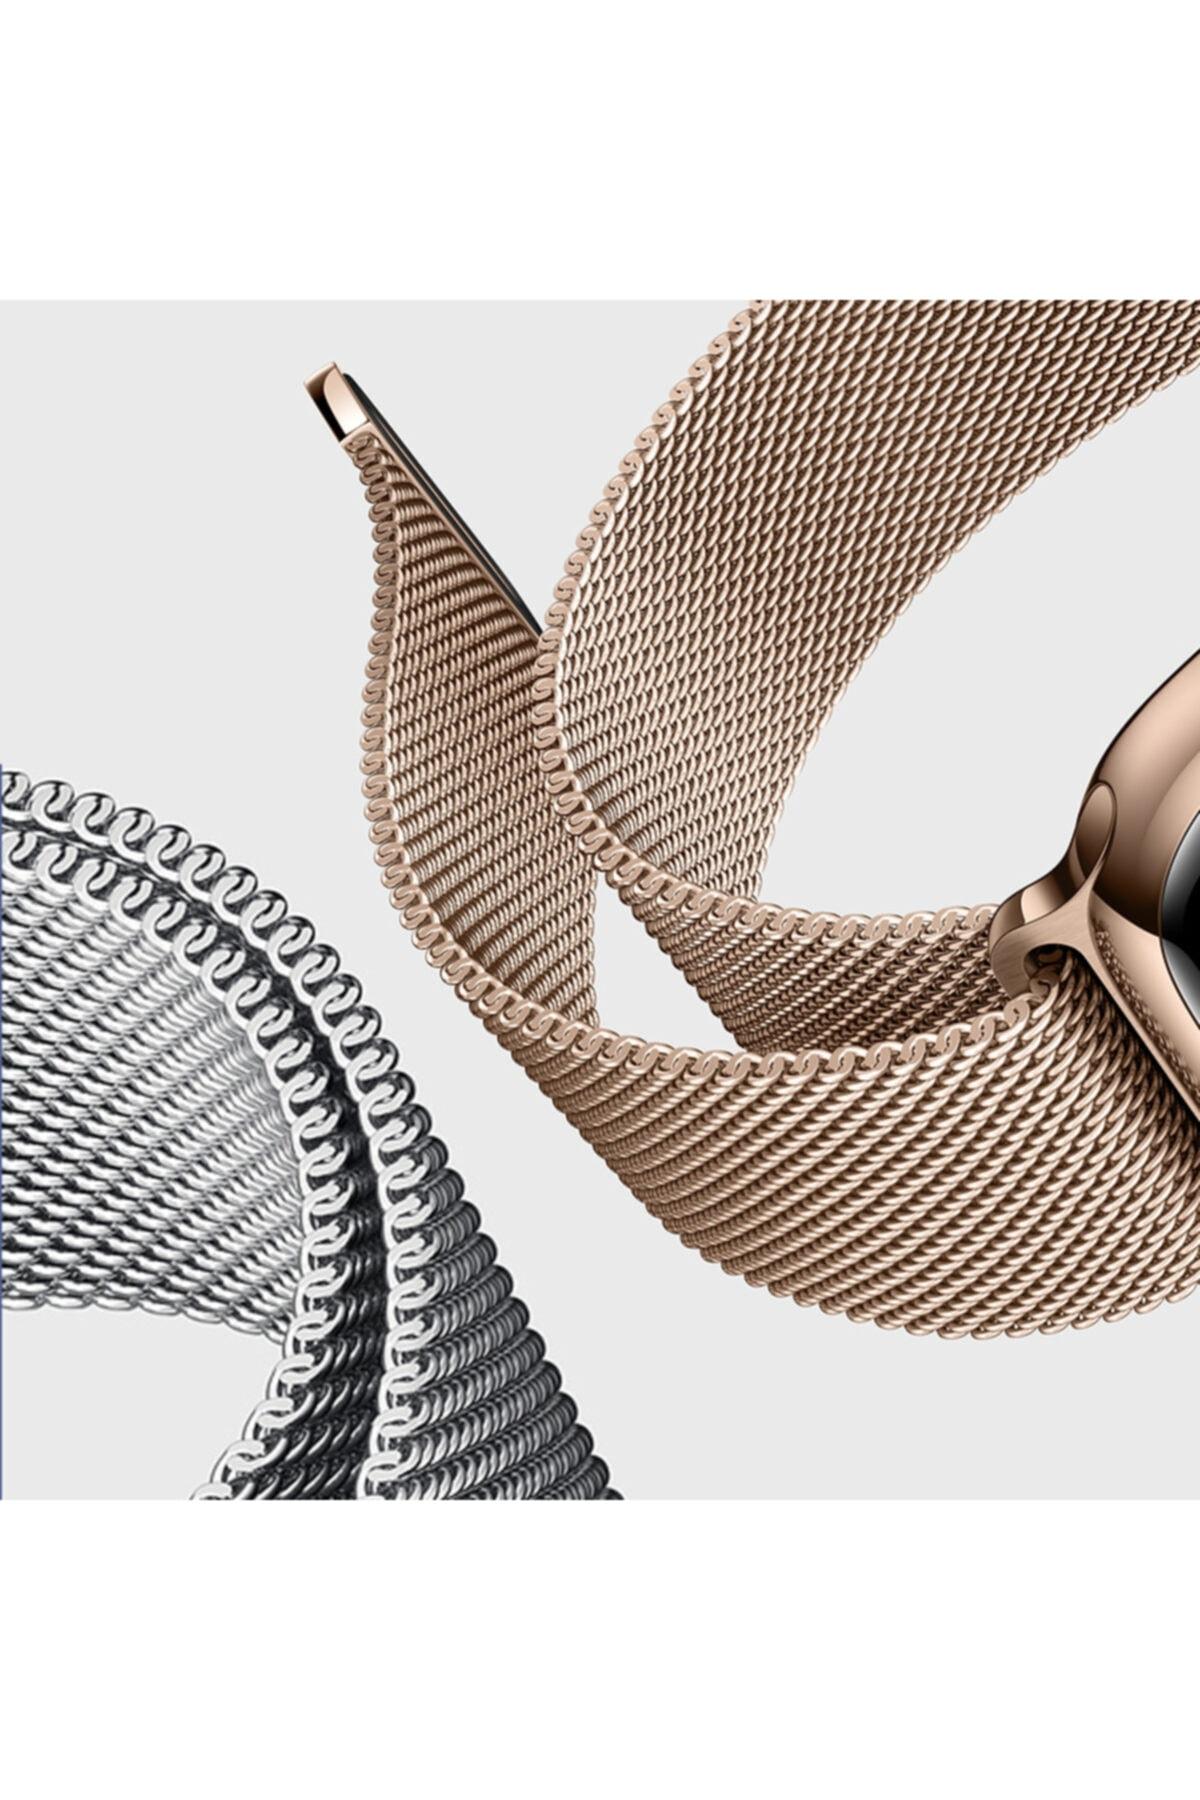 Microsonic Microsonic Watch 1 38mm Milanese Loop Kordon Gümüş 2